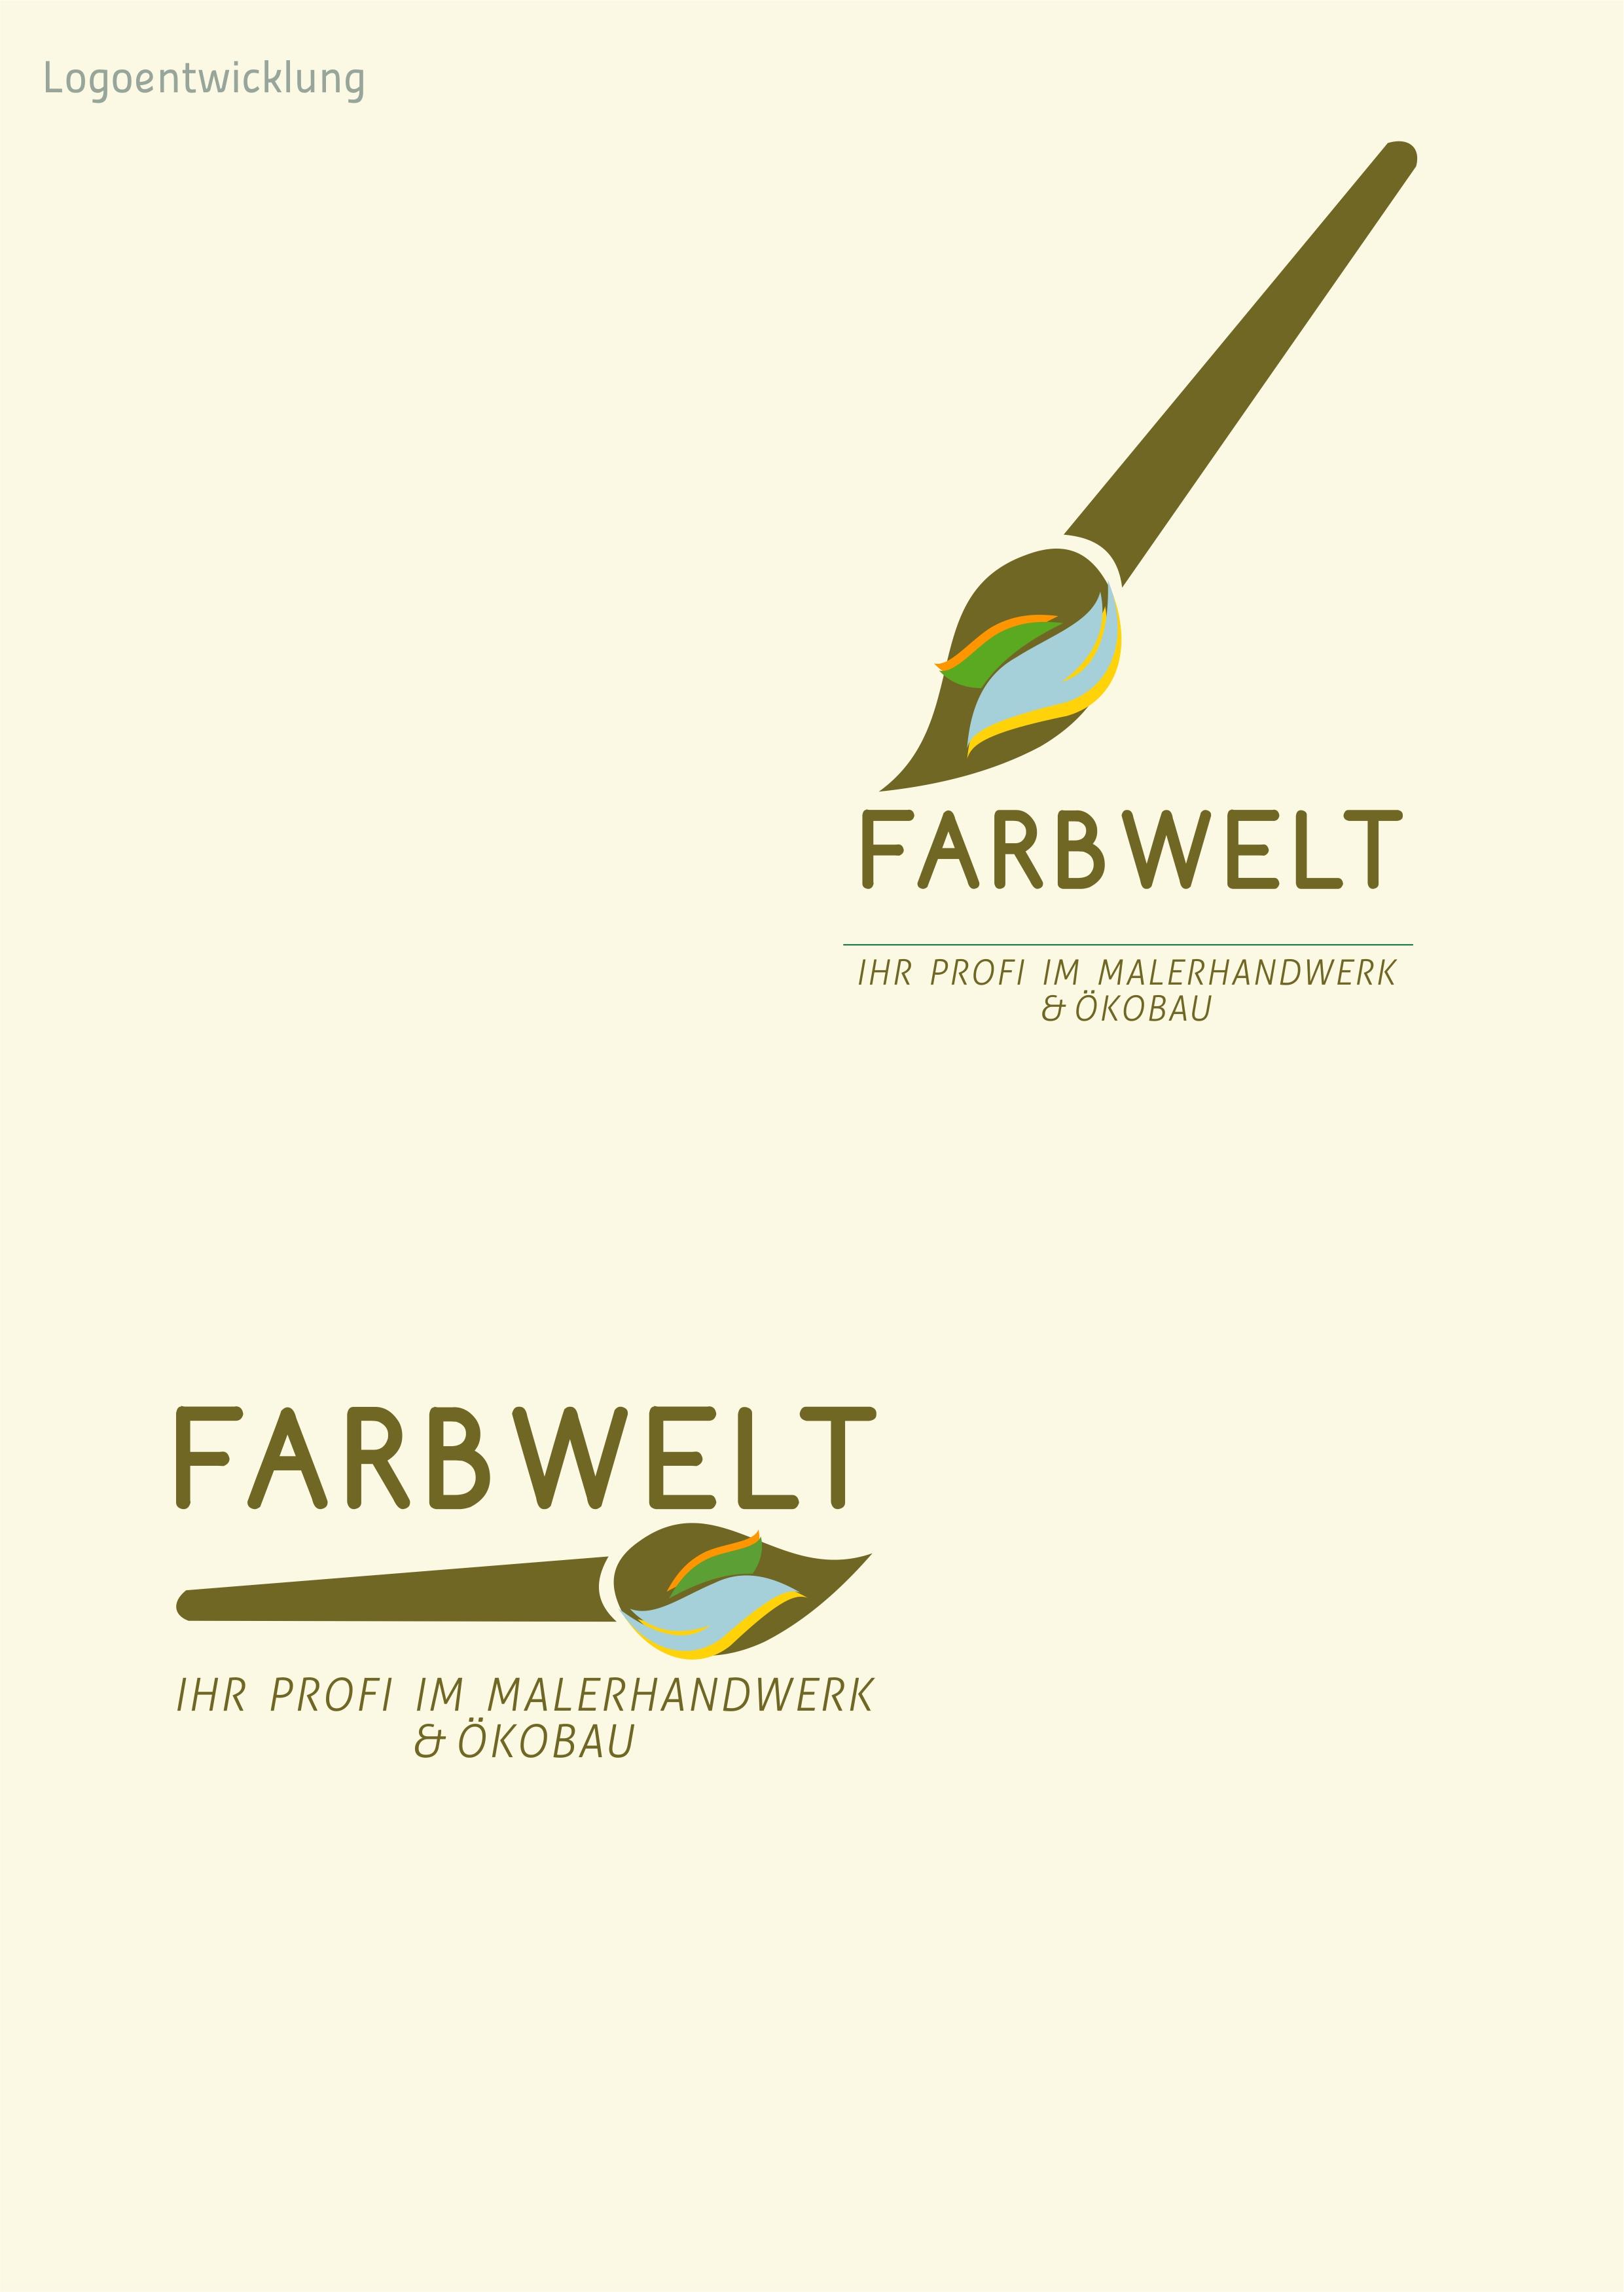 Farbwelt Ug Ideespice